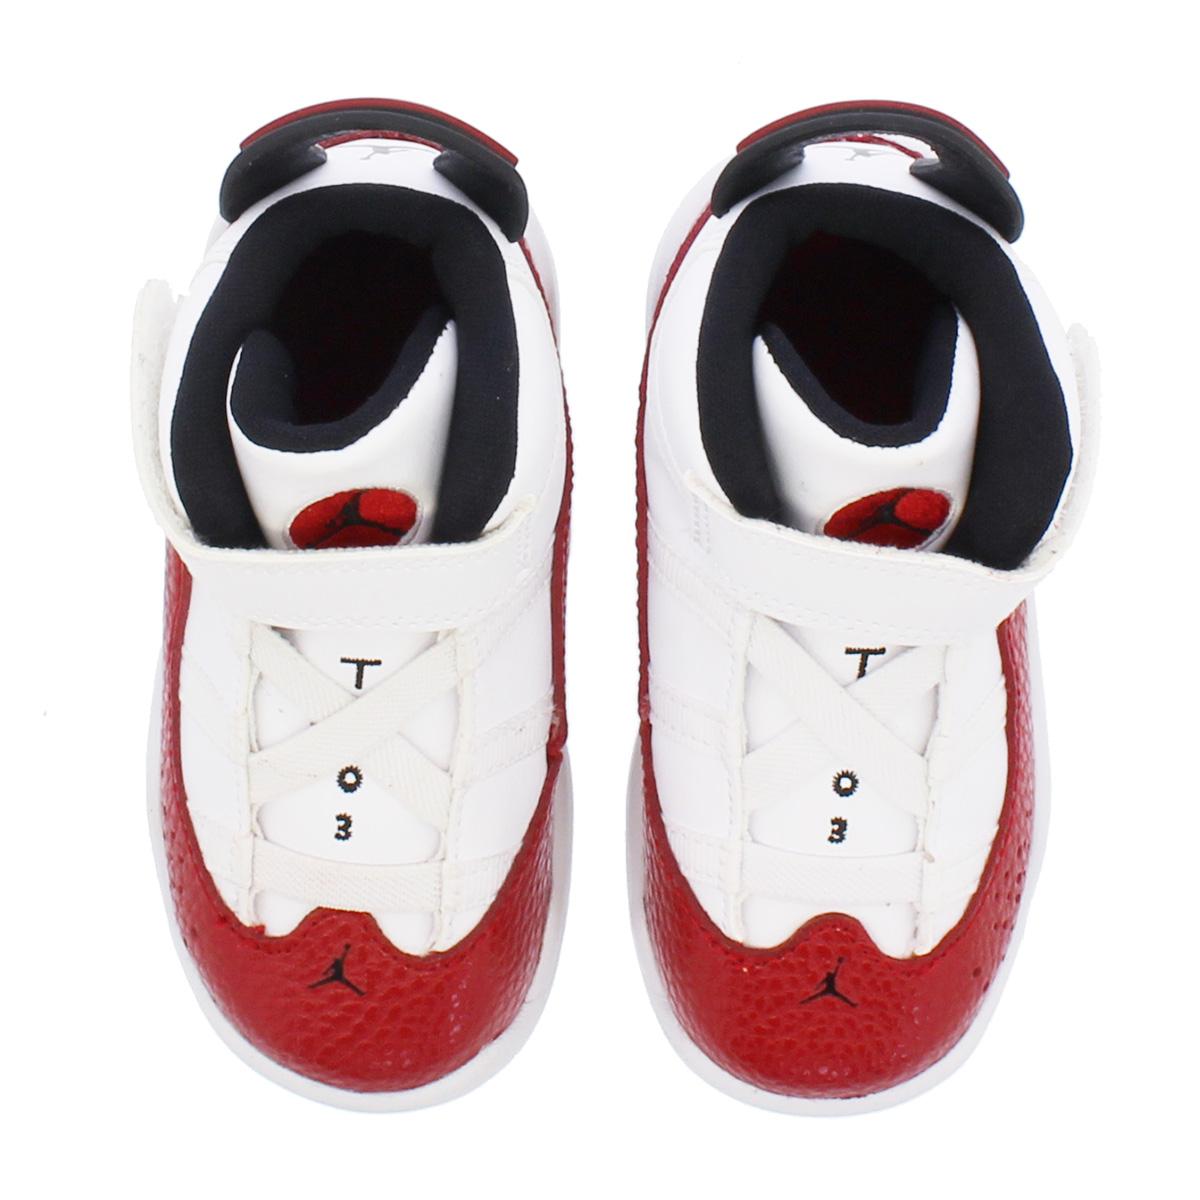 cd4dcb83306242 SELECT SHOP LOWTEX  NIKE JORDAN 6 RINGS TD Nike Jordan 6 RINGS Co ...